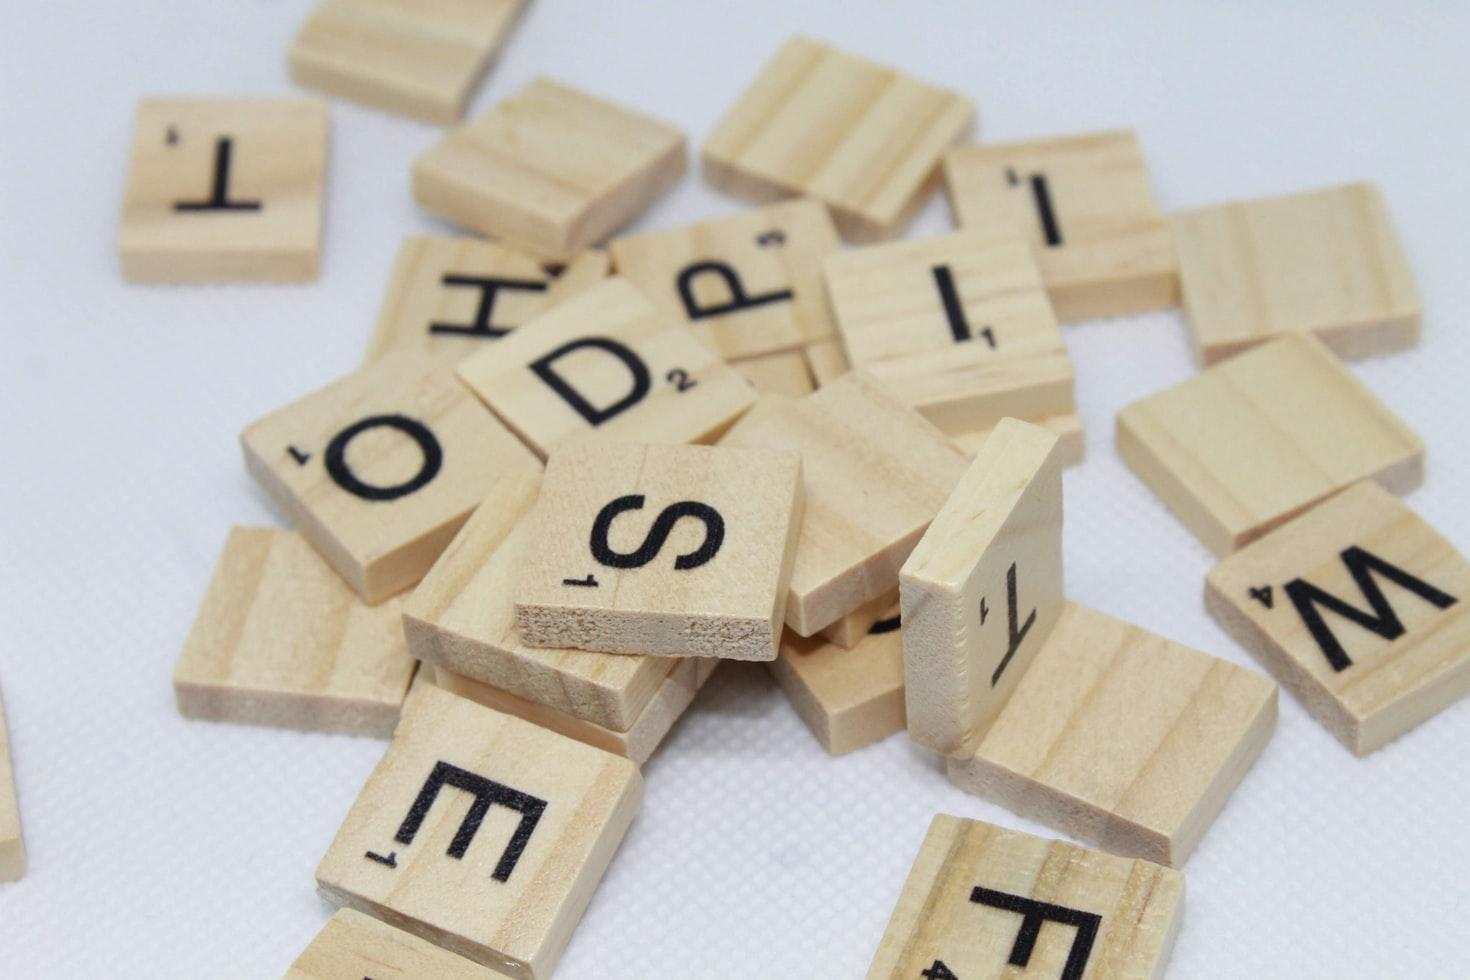 mots clefs internet